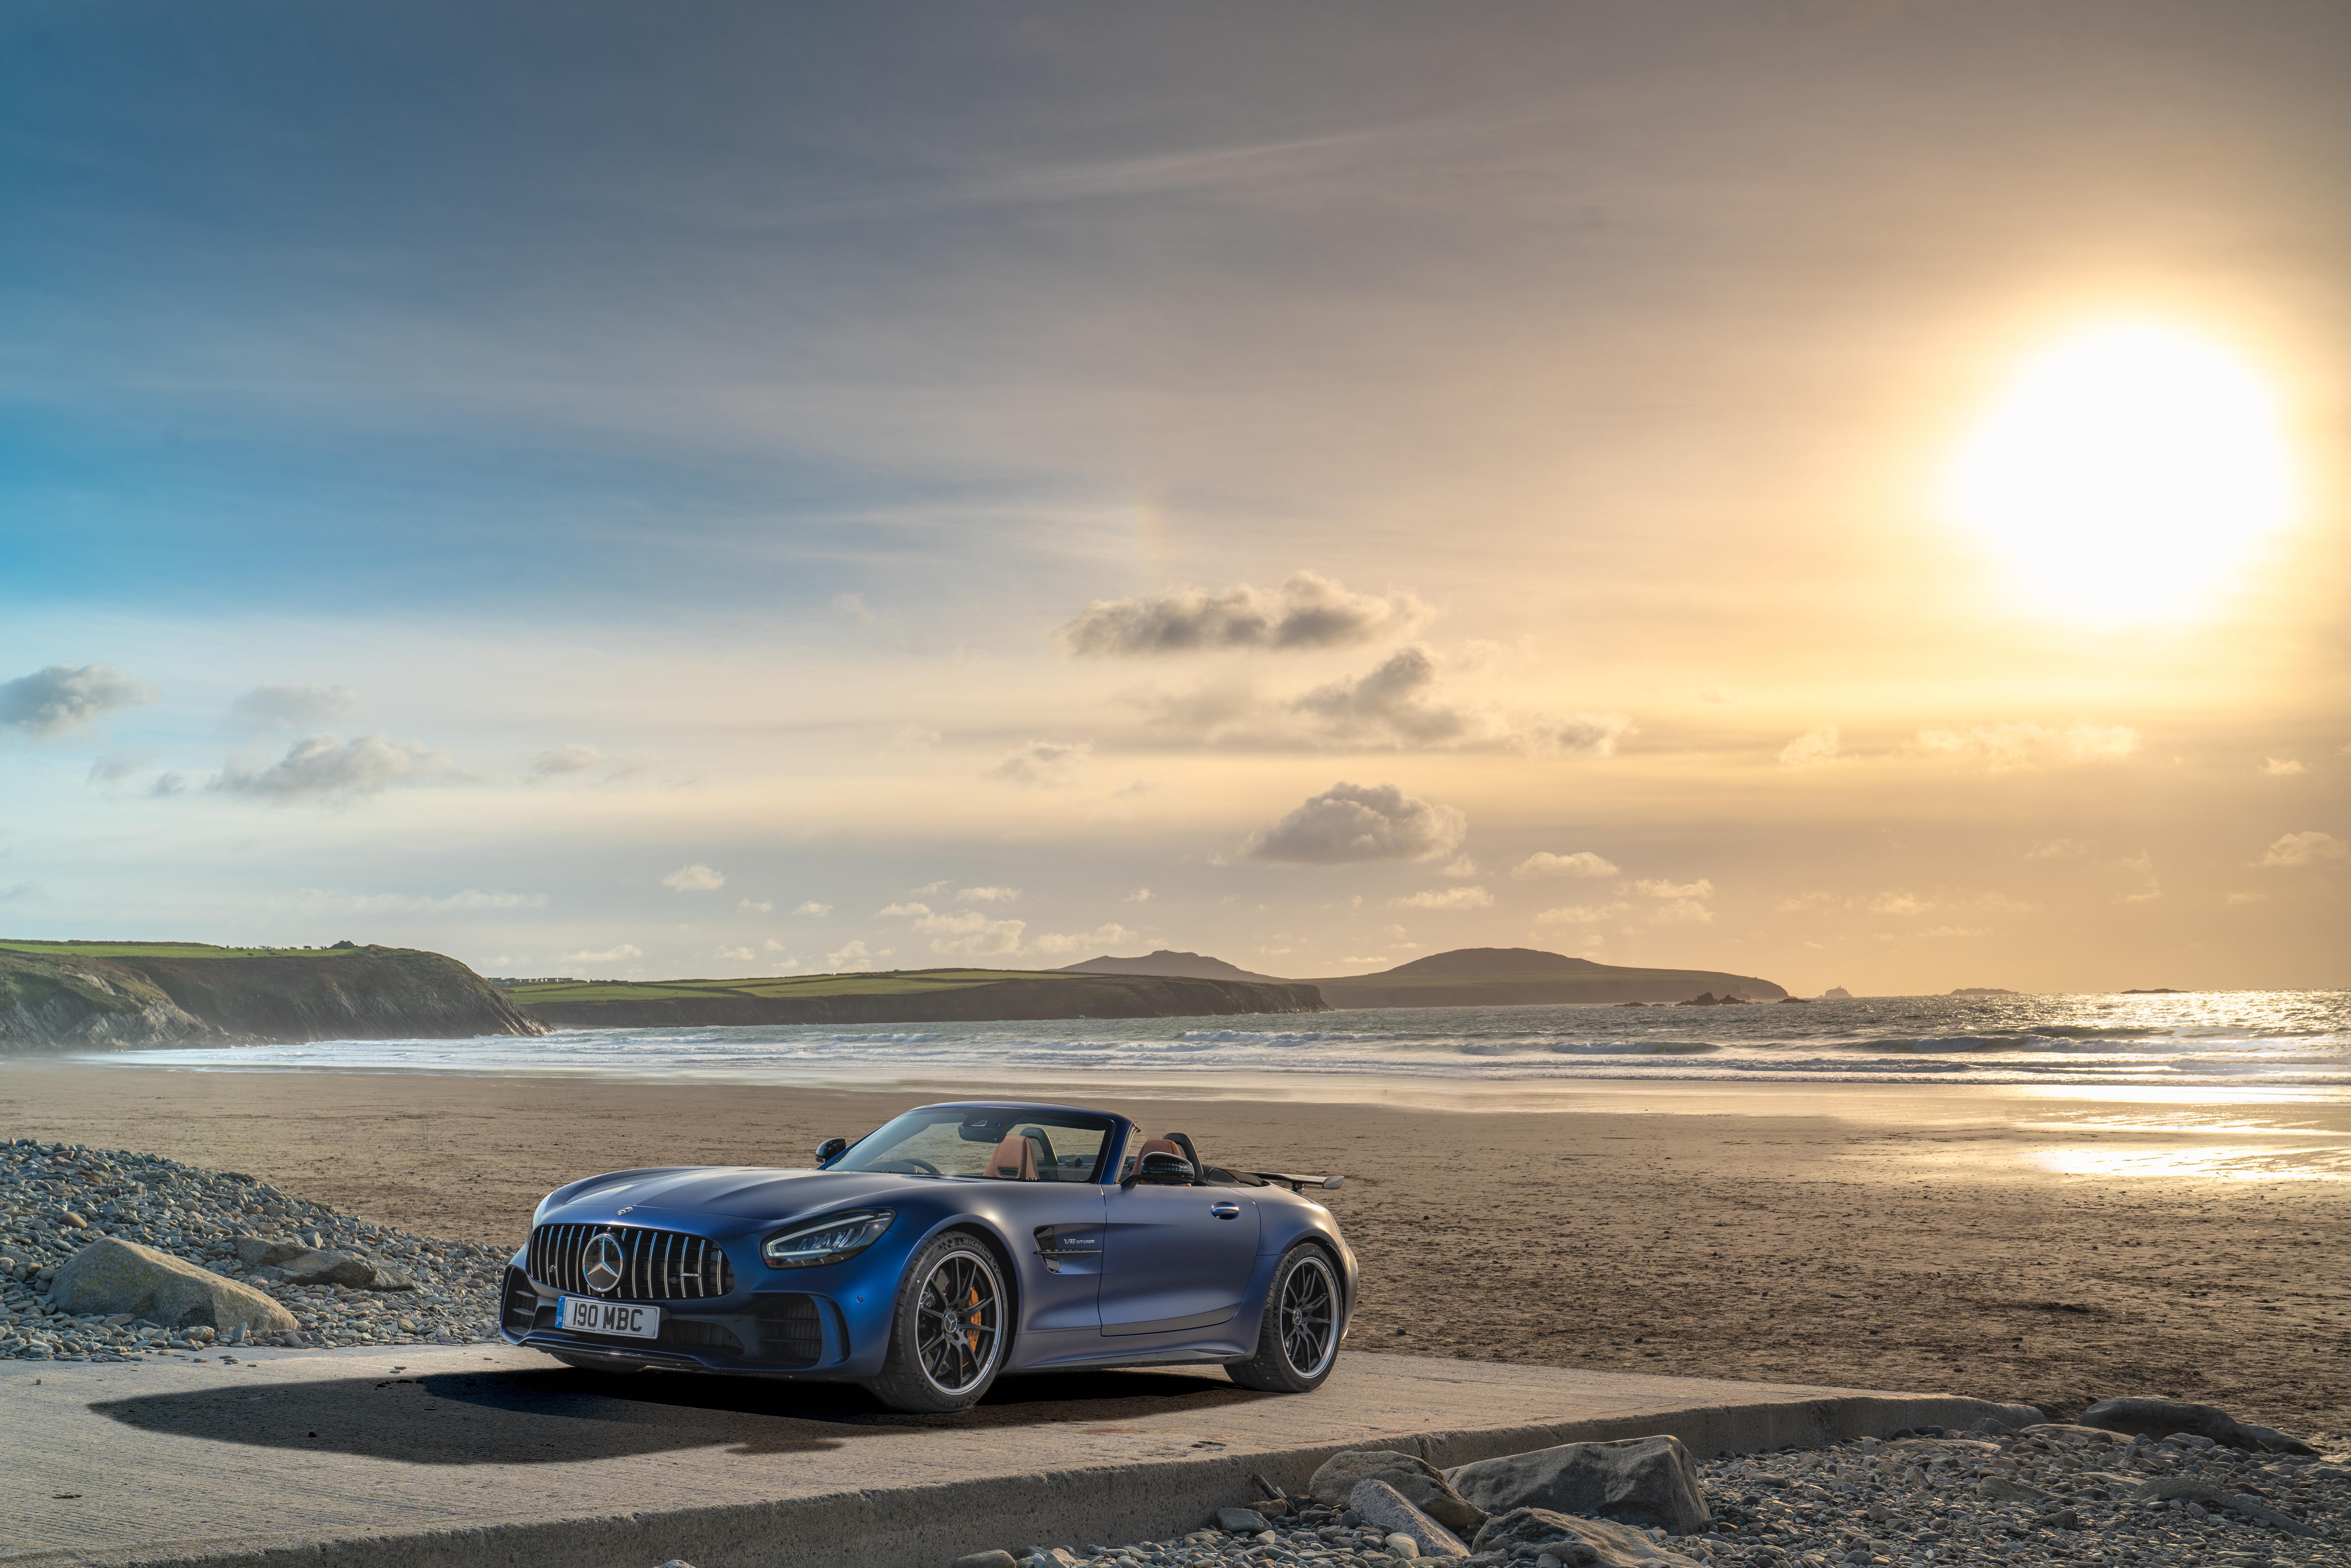 2019 mercedes amg gt r roadster 1577652714 - 2019 Mercedes AMG GT R Roadster - Mercedes AMG GT R Roadster 4k wallpaper